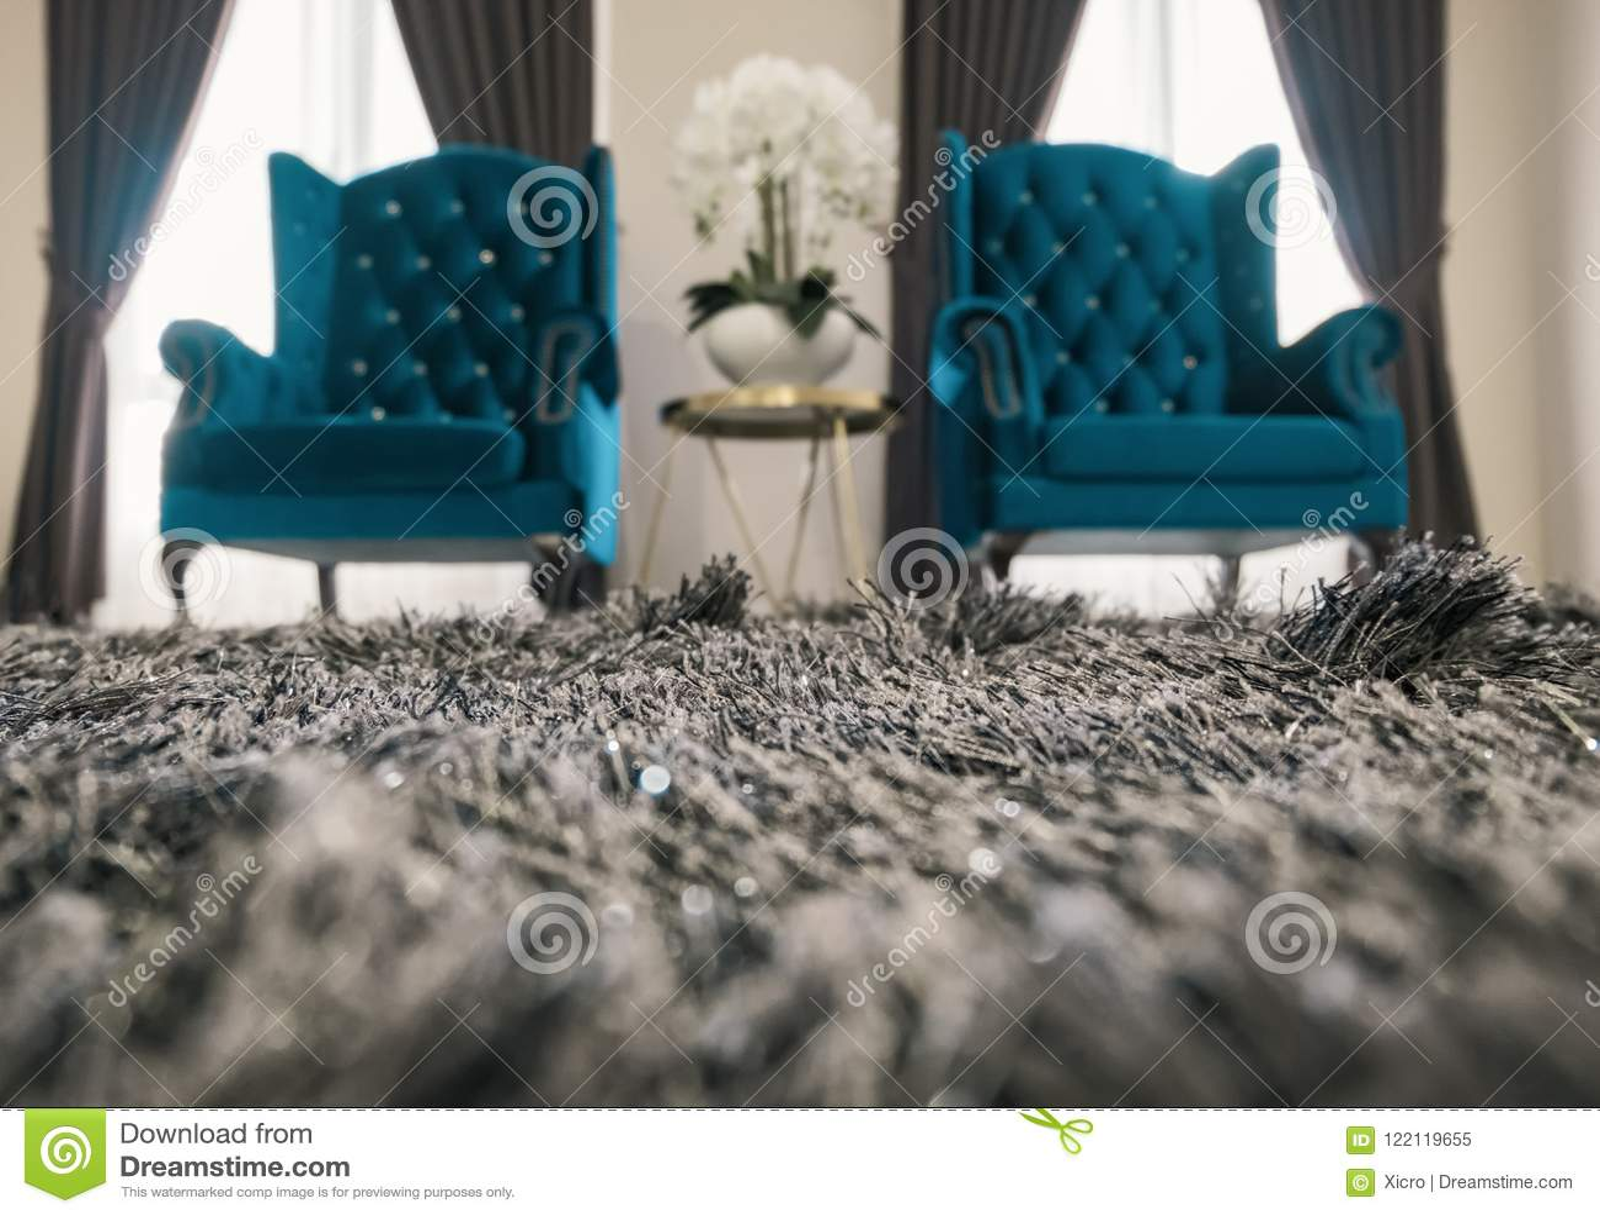 Pair Of Modern Design Sofas In Living Room For Relaxing Stock Image ...